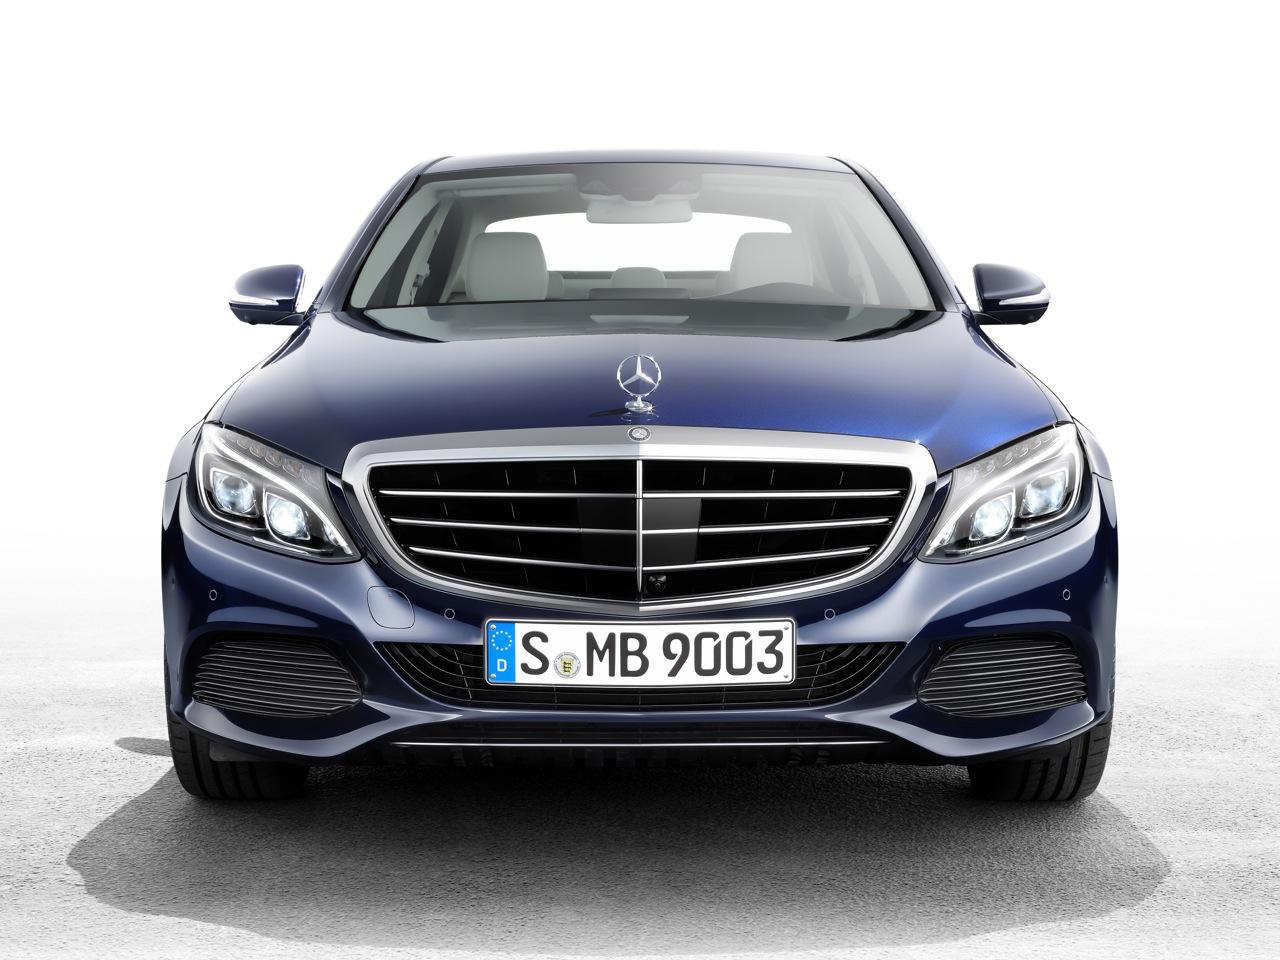 Mercedes C 300 Bluetec Hybrid